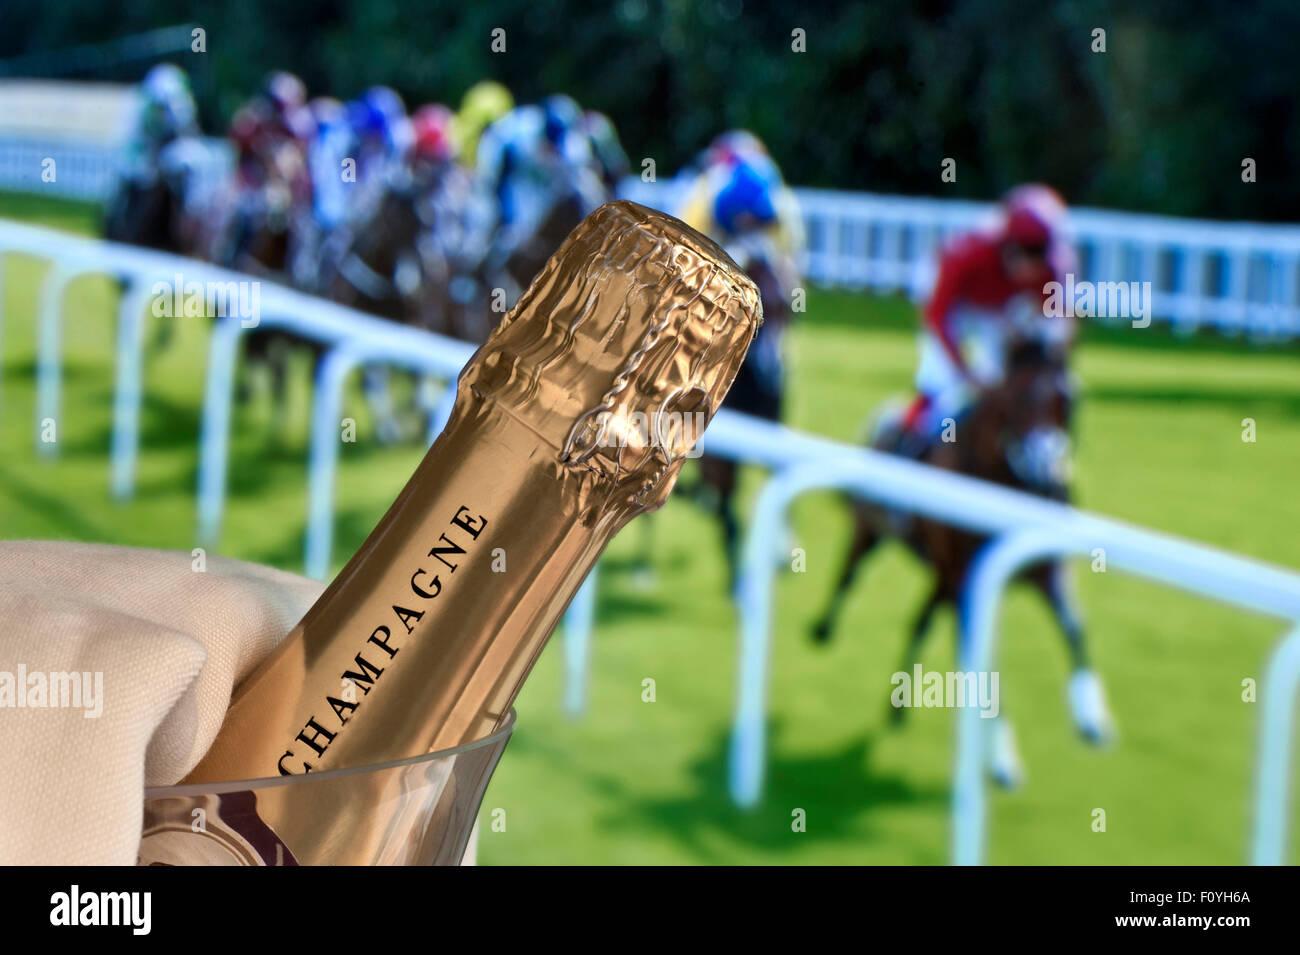 Carreras de Caballos Carreras de Champagne Champán de lujo en cubo de hielo con damas día Royal Ascot Imagen De Stock